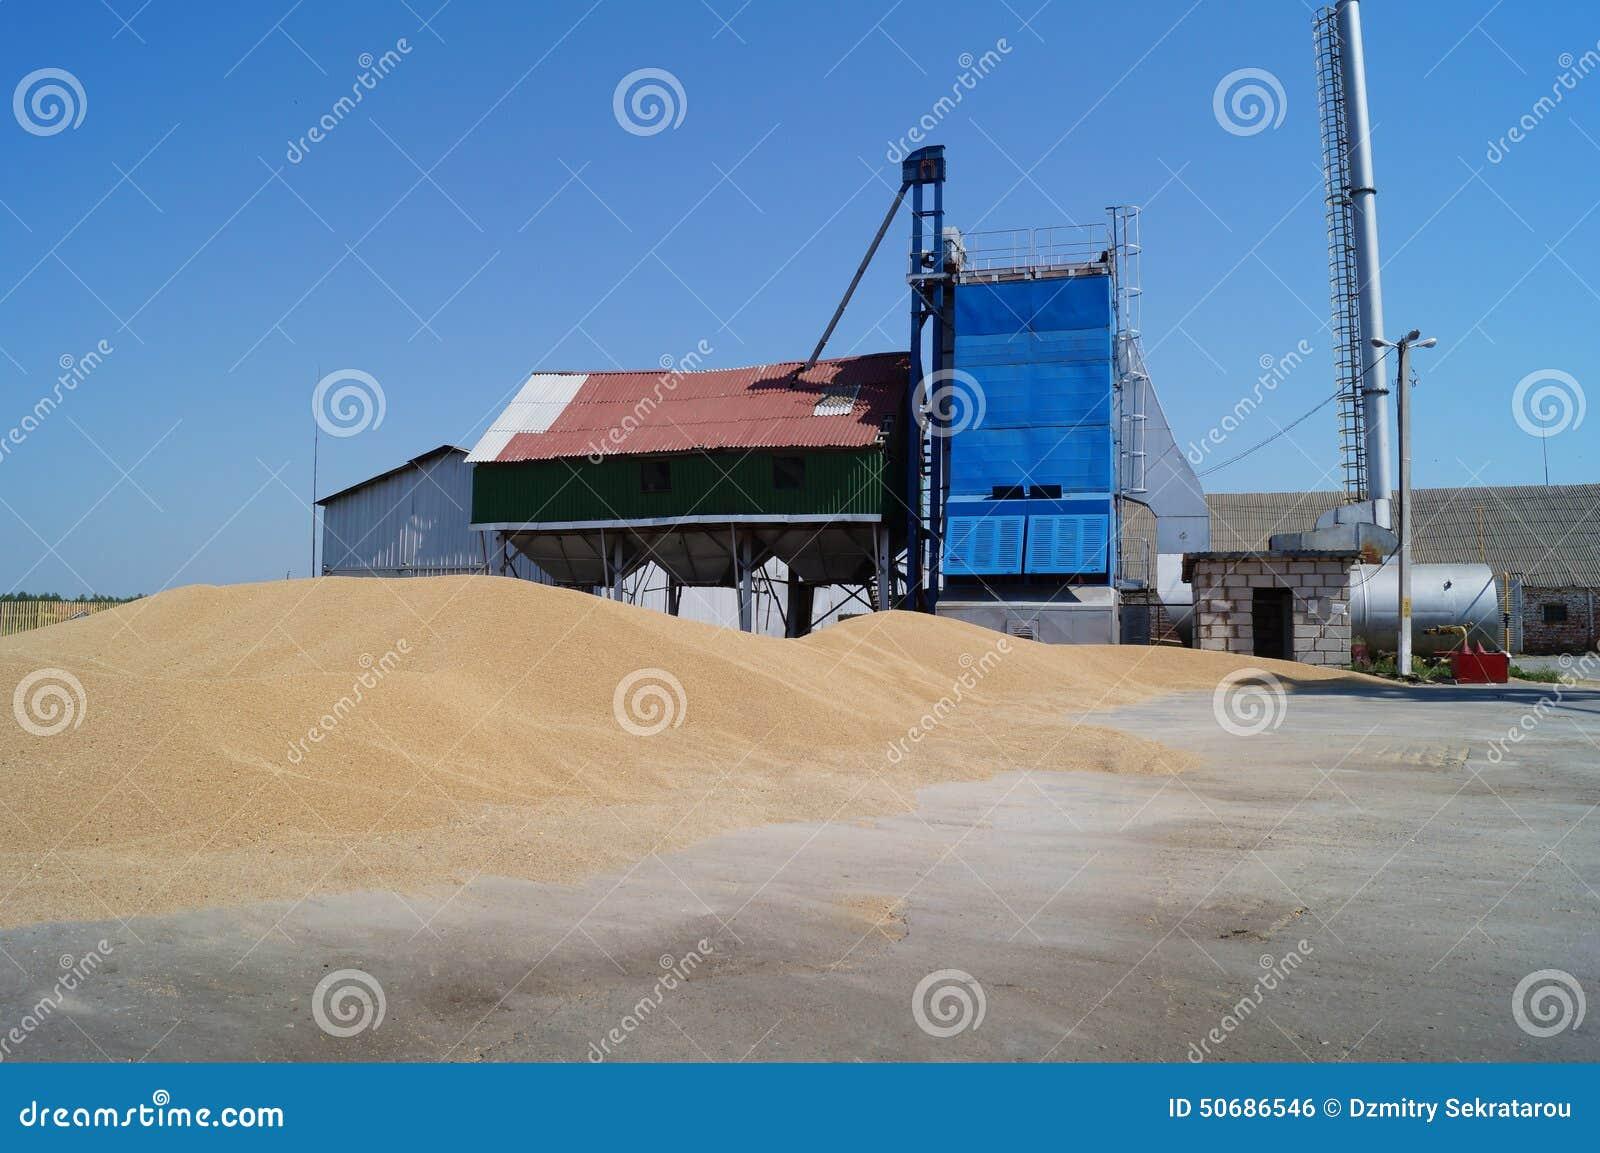 Download 农村的生活 草料驻地和五谷山 库存照片. 图片 包括有 仍然, 操场, 麦子, 站点, 岗位, 烘干, 存贮 - 50686546